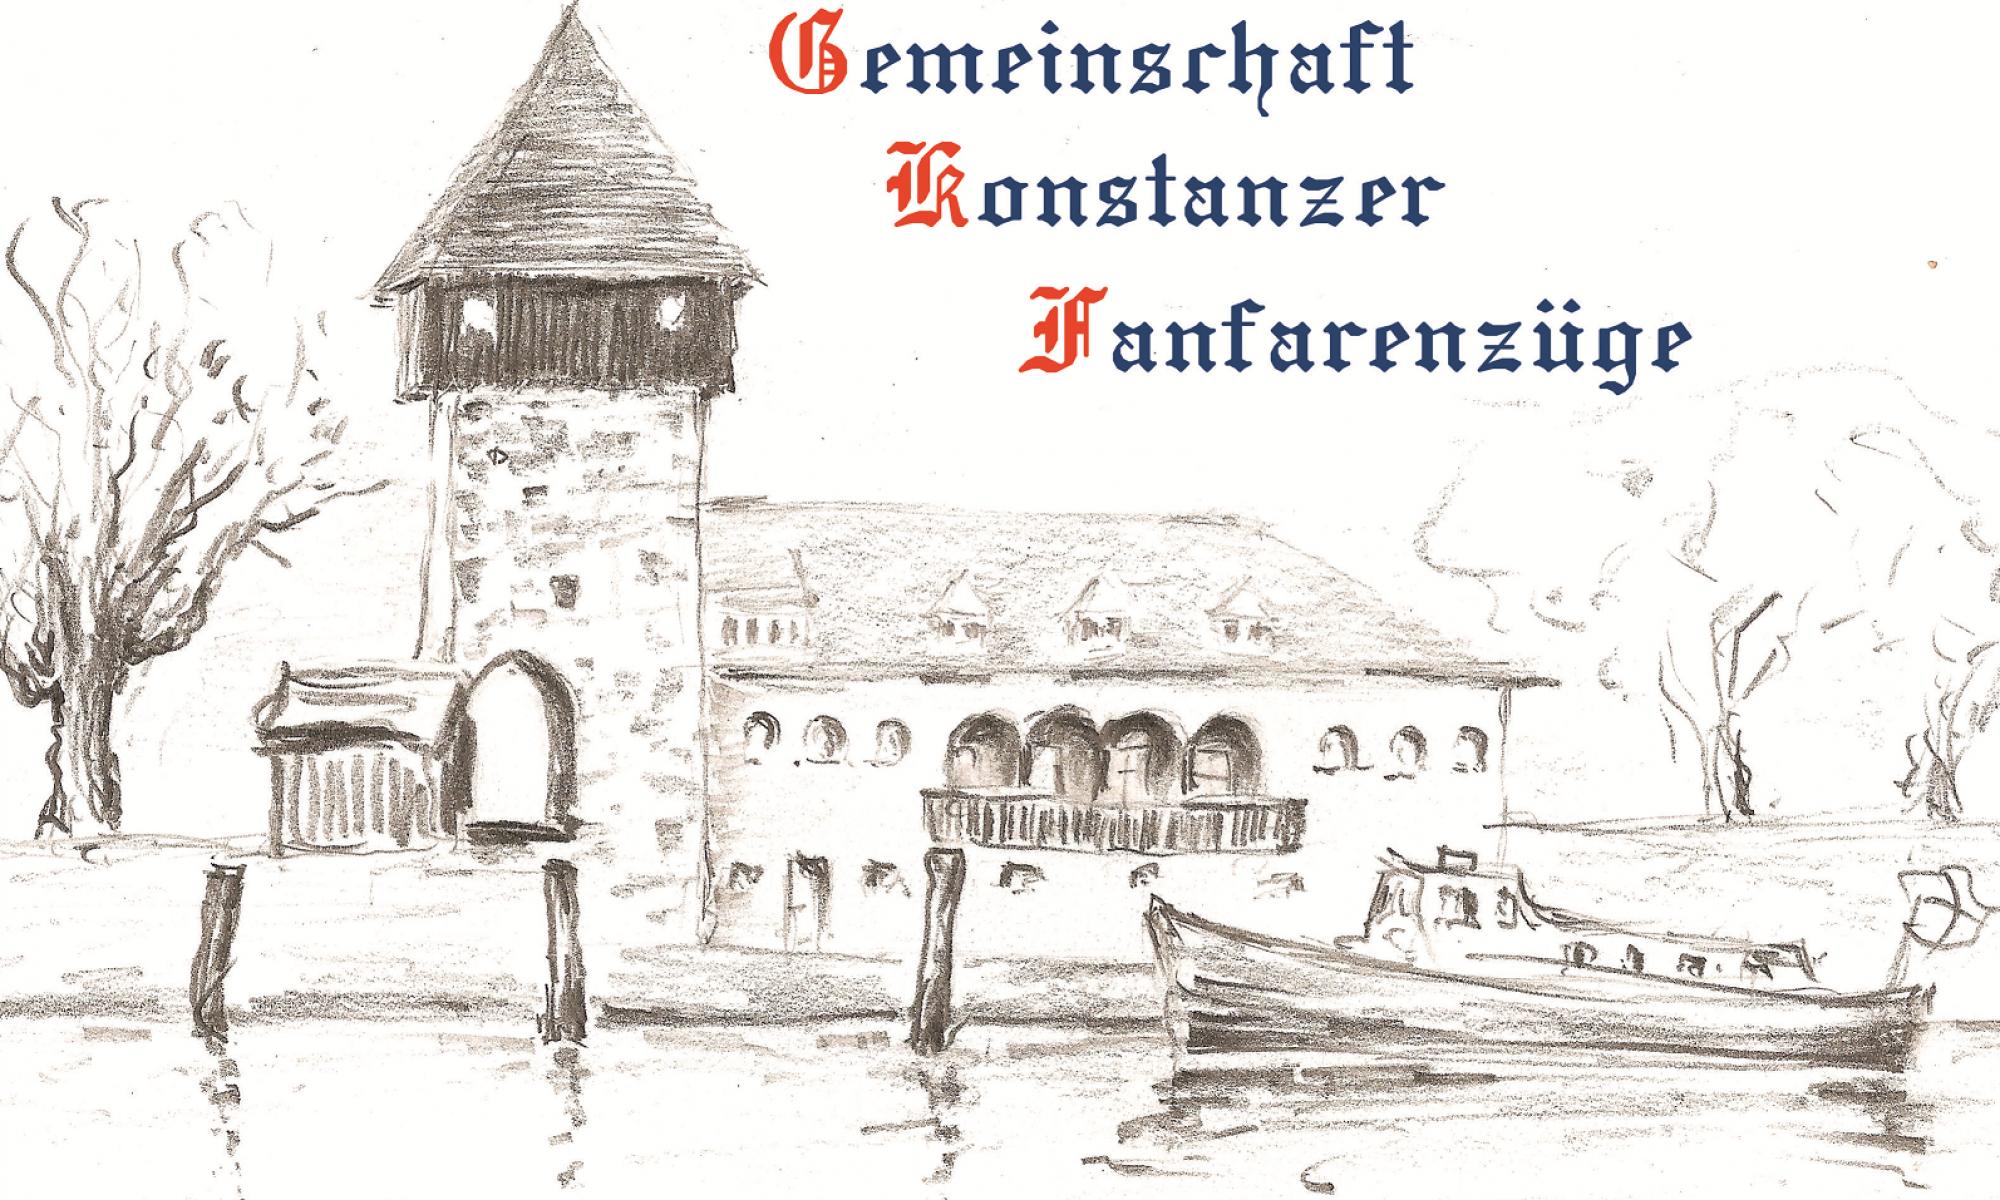 Gemeinschaft Konstanzer Fanfarenzüge